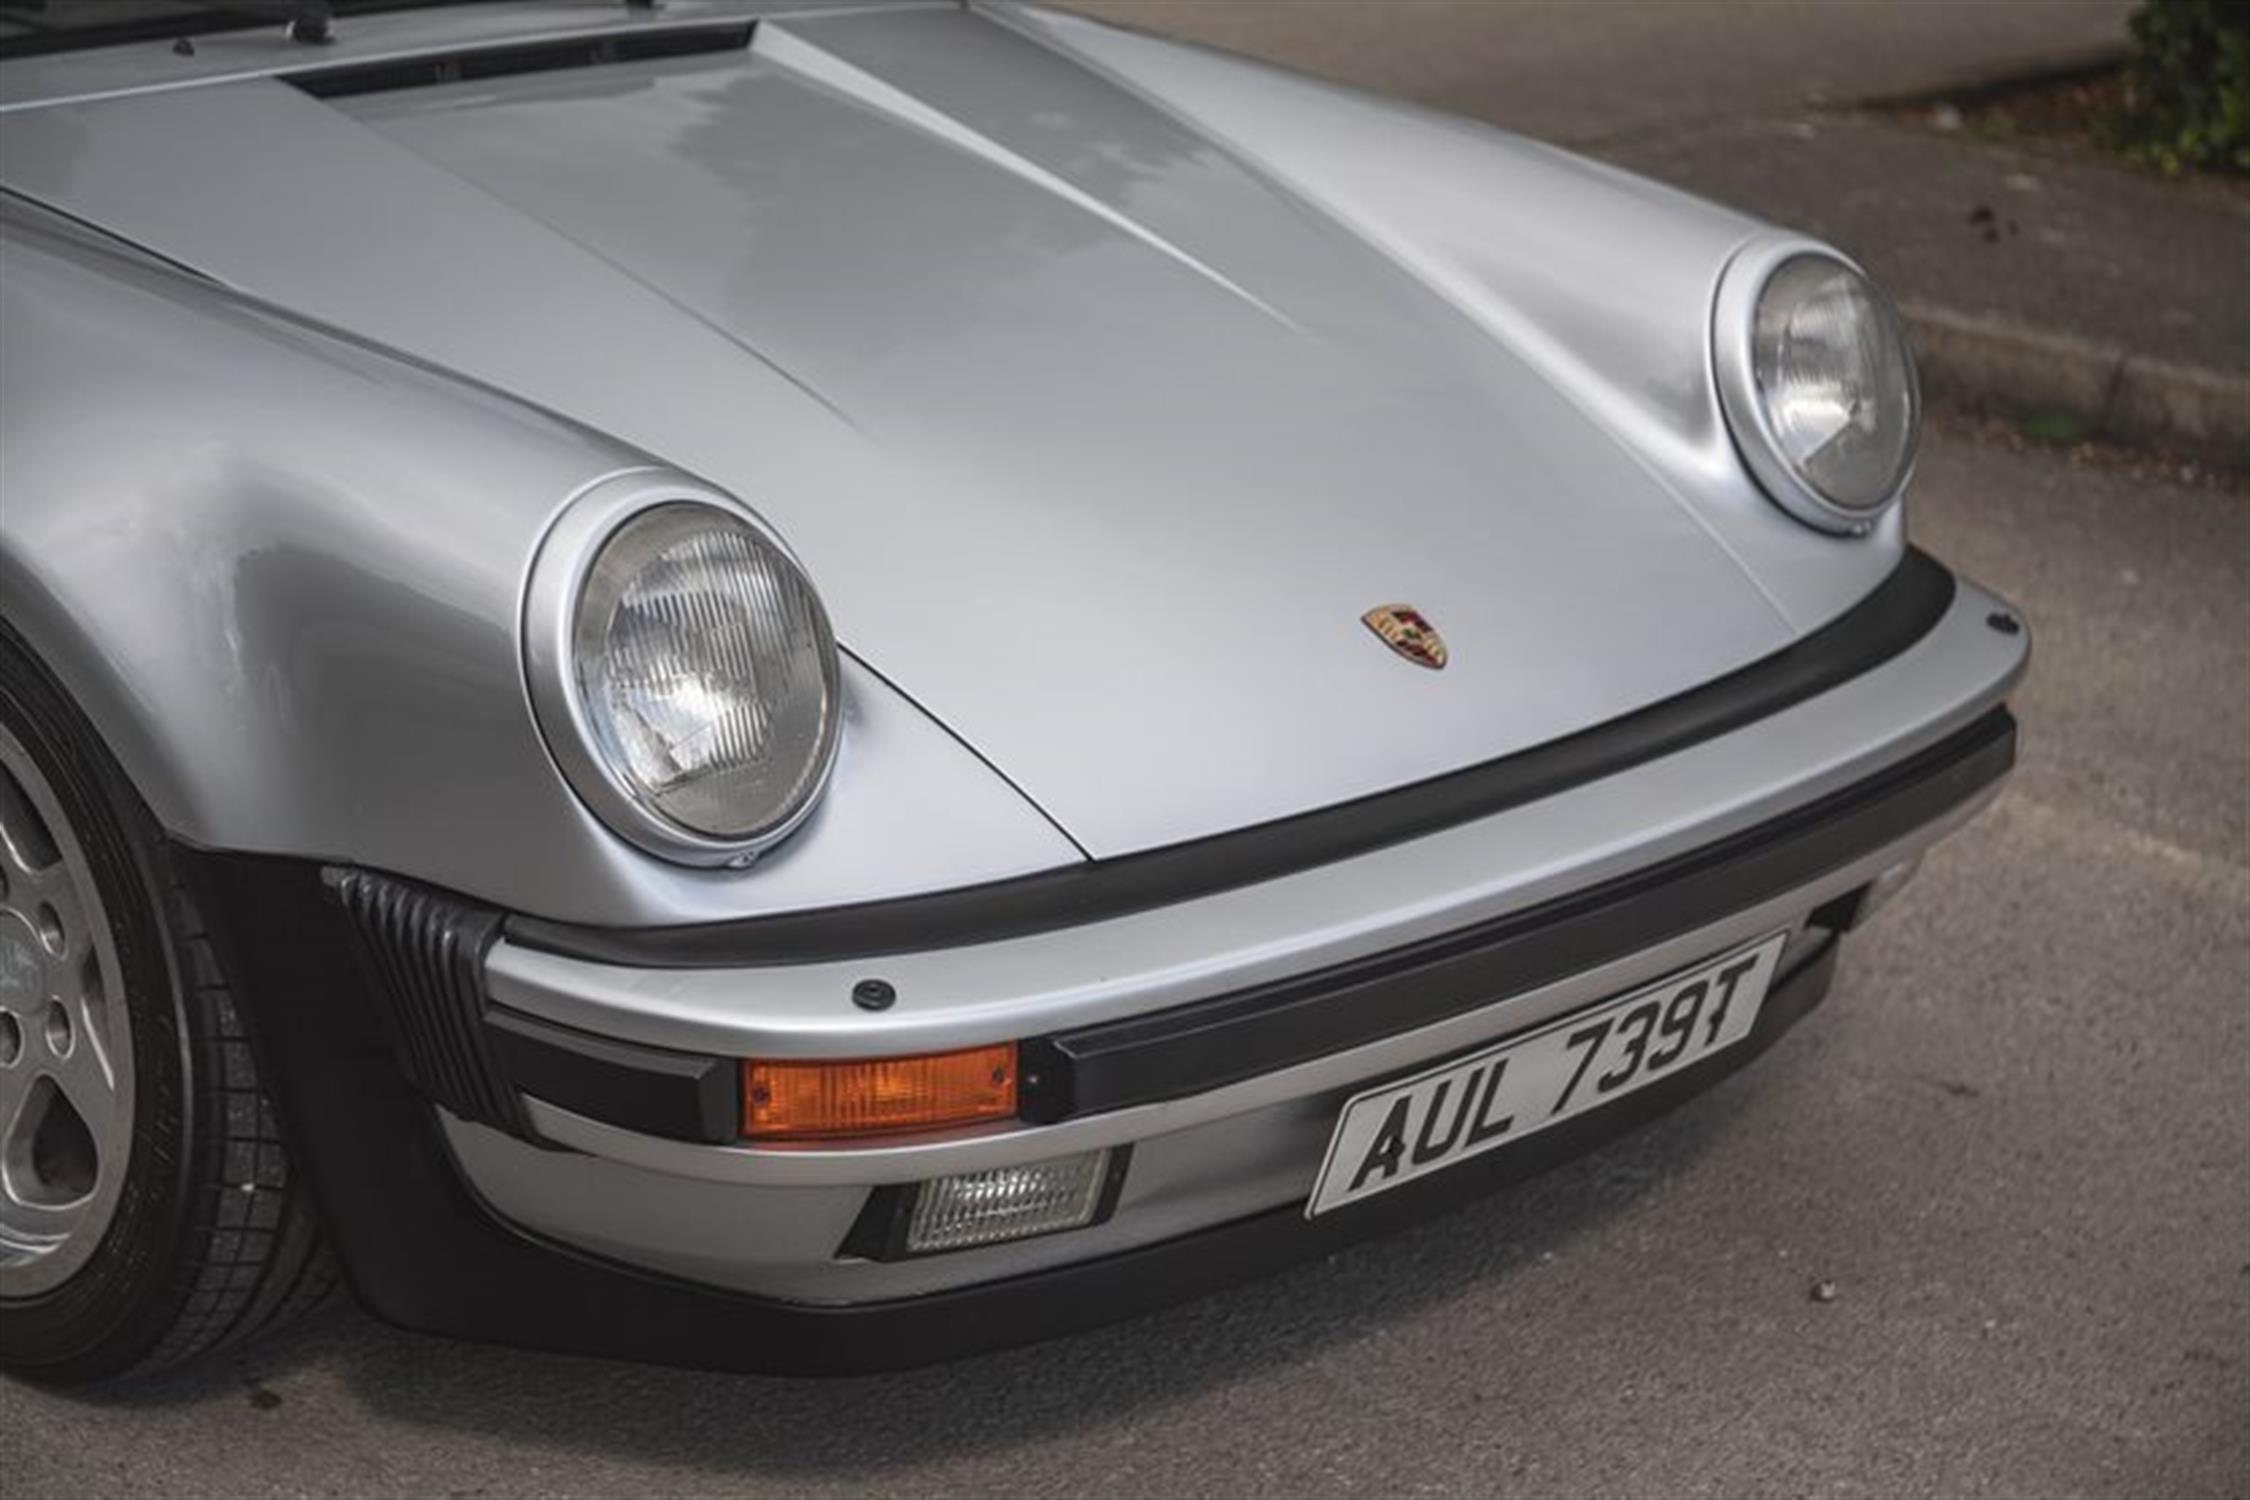 1979 Porsche 911 Turbo 3.3-Litre - Image 5 of 10